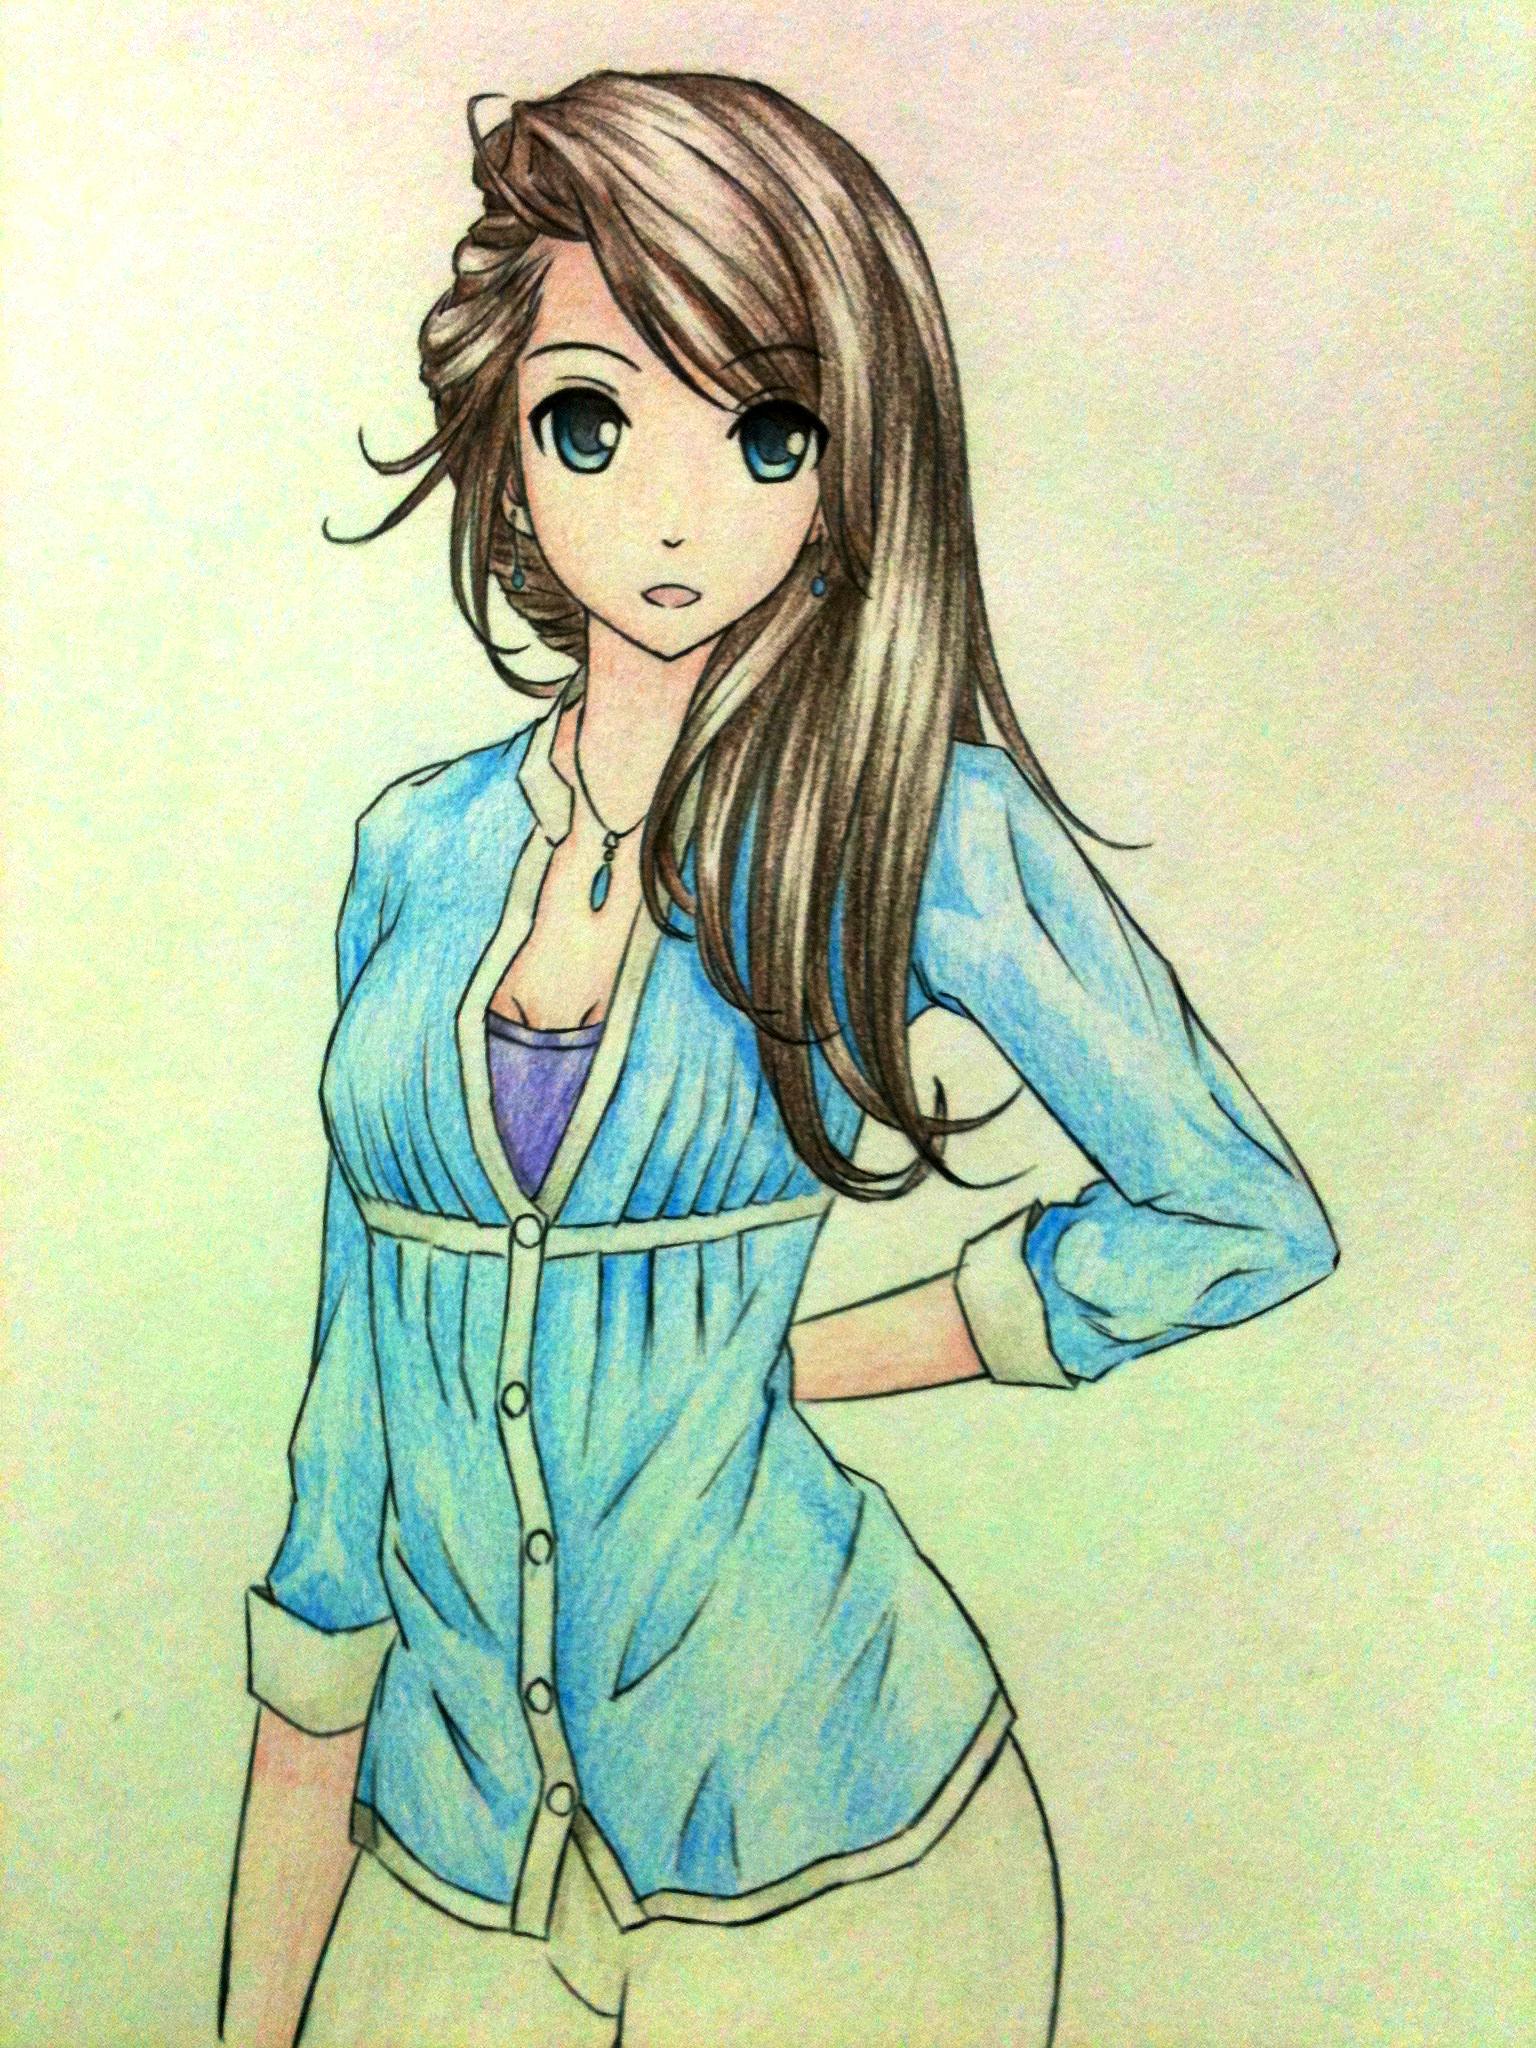 Anime girl - Jessie